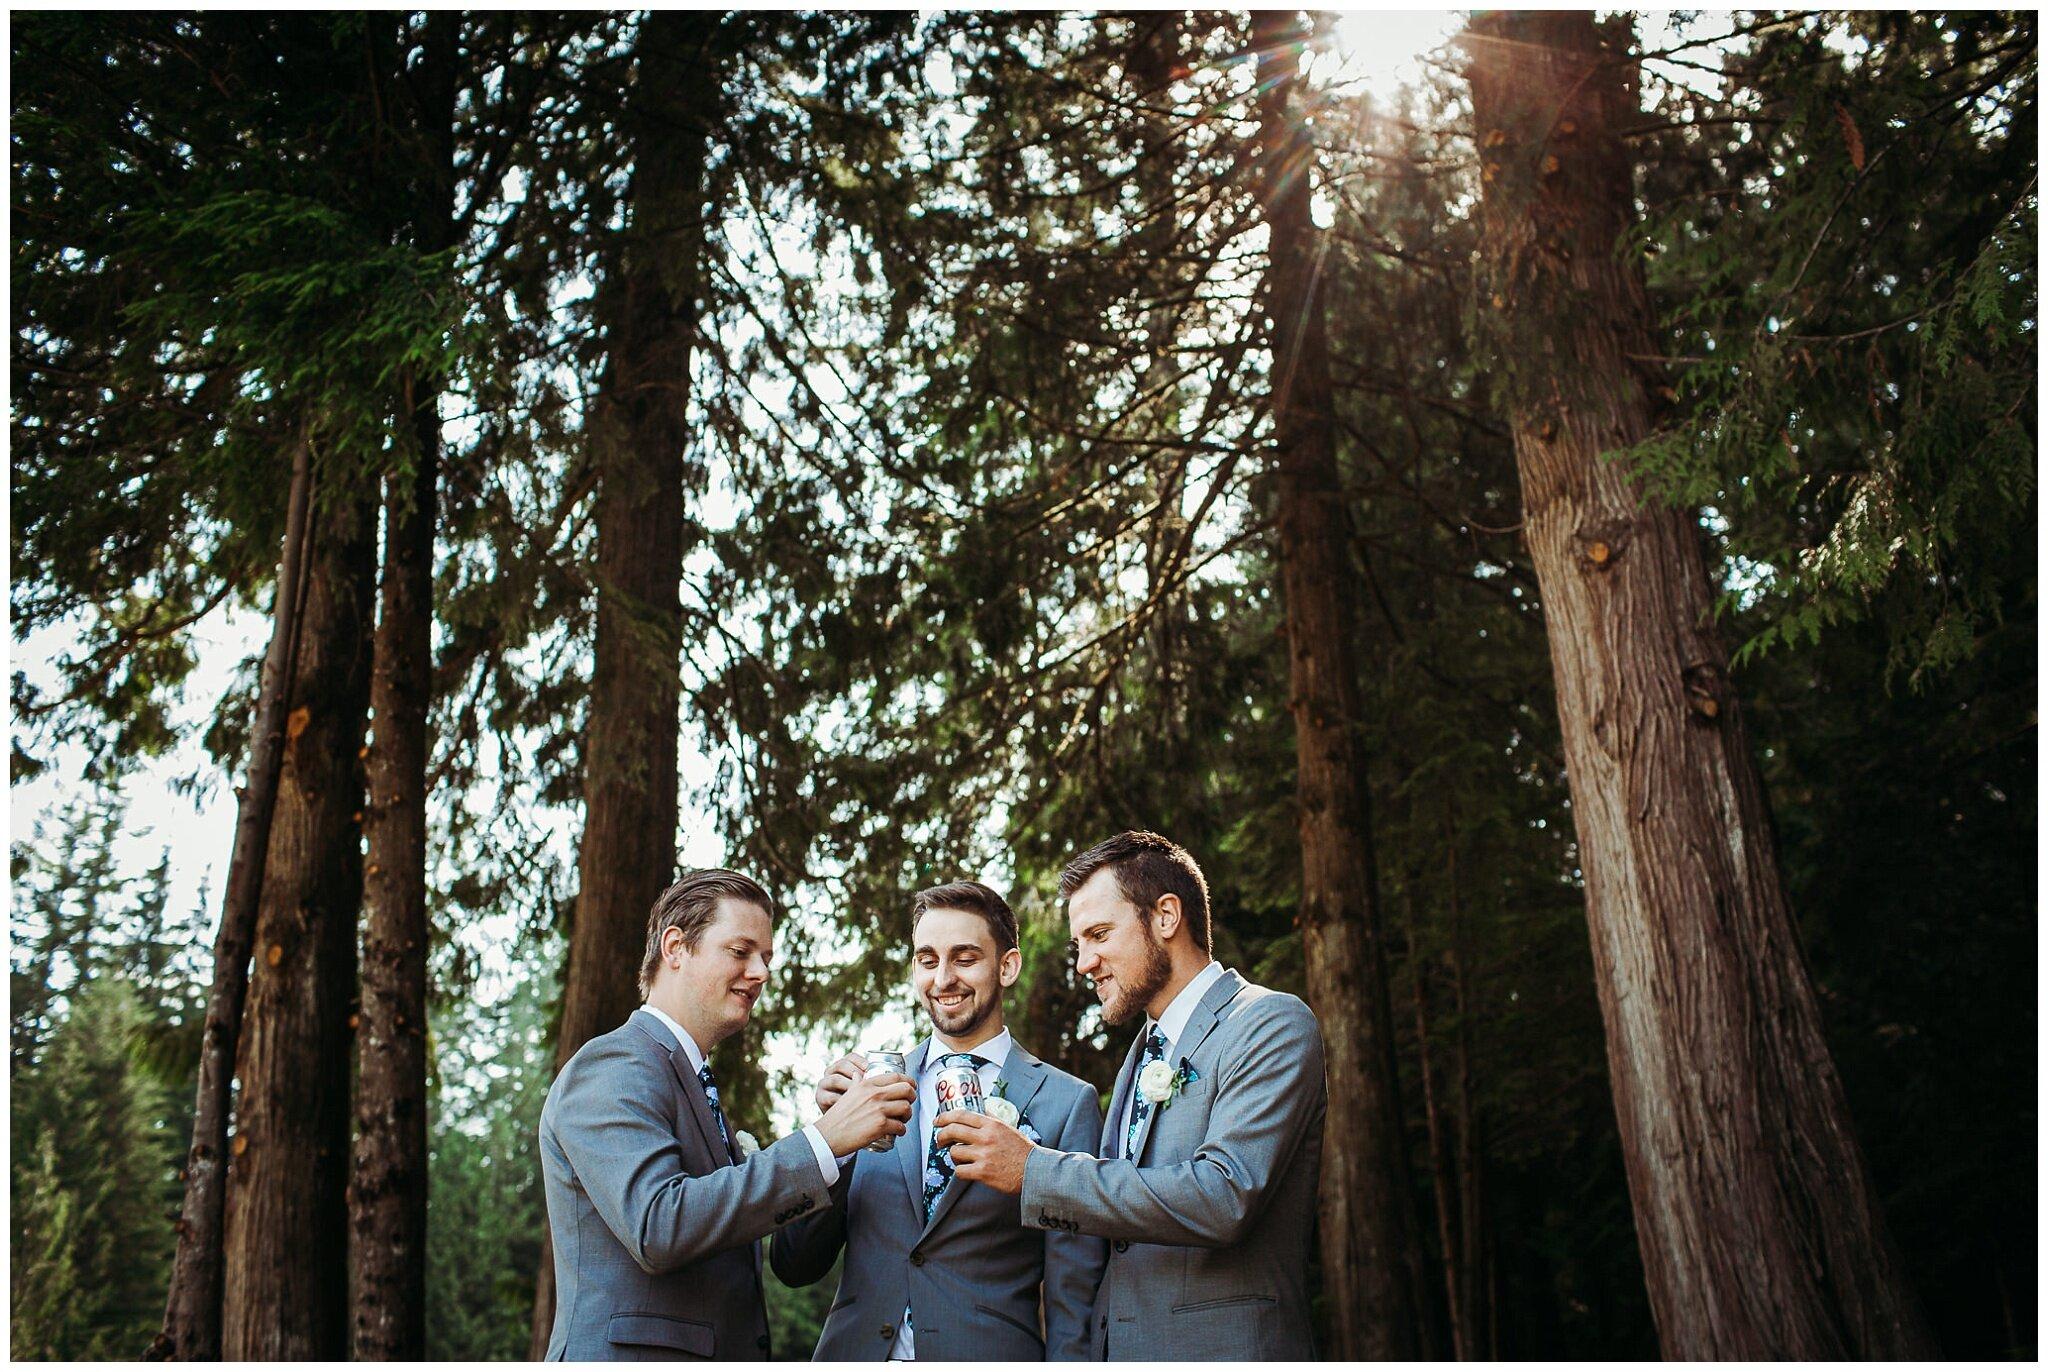 Eighteen Pastures Mission  BC Abbotsford BC Christian Wedding Photographer Summer Bride Groom Inspo_0026.jpg